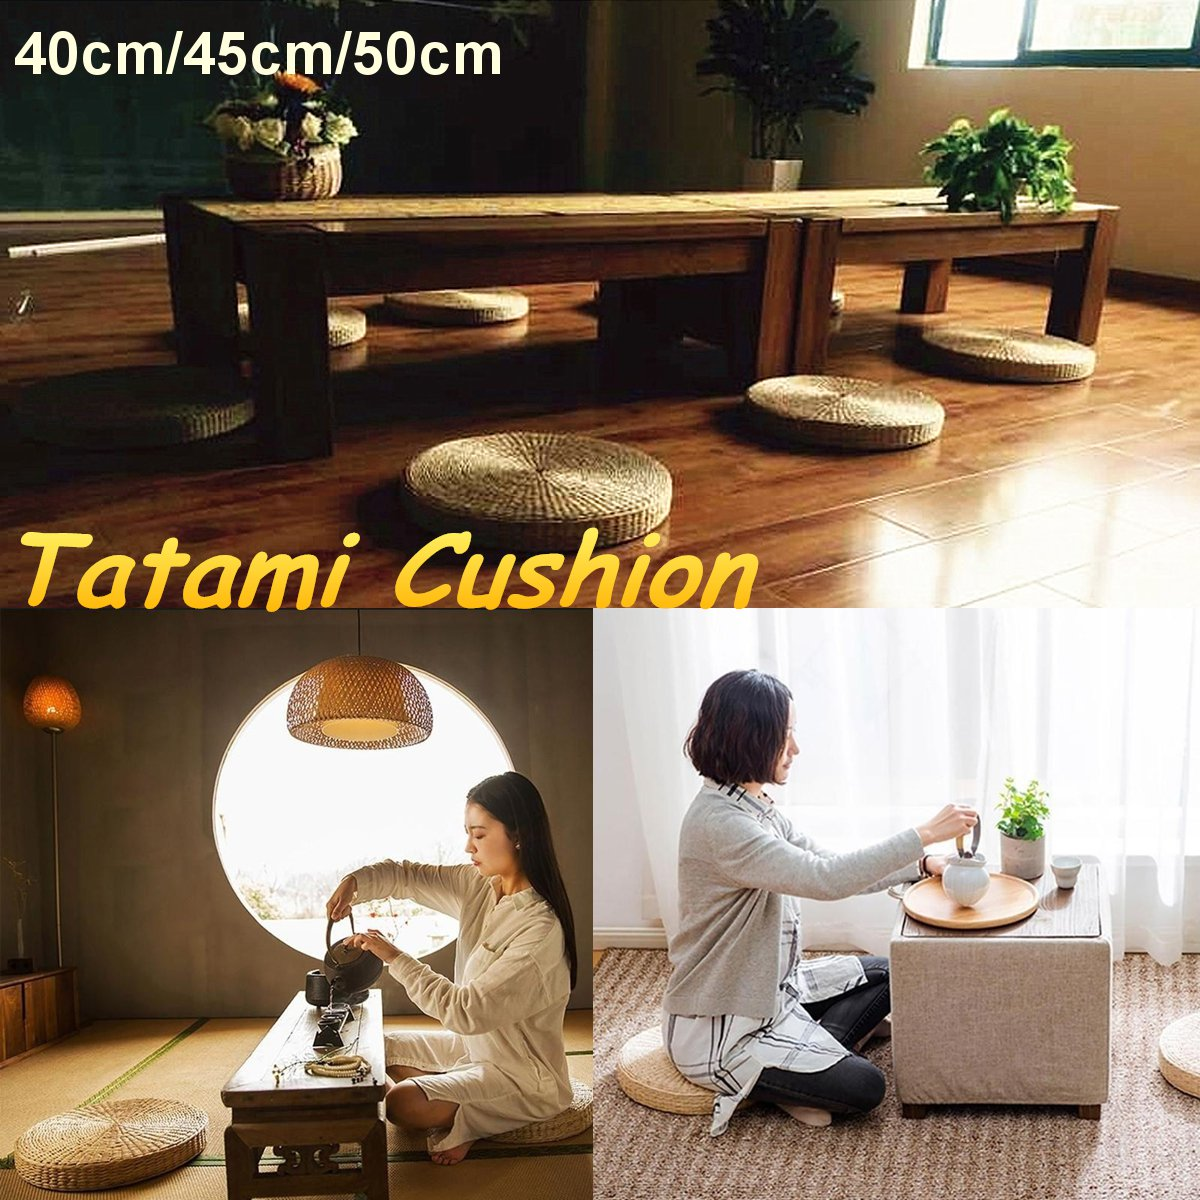 Rattan Tatami Seat Cushion Sofas Round Floor Meditation Yoga Mat Chair Sitting Futon Cushion Tatami Buddha Pad 40/45/50cm